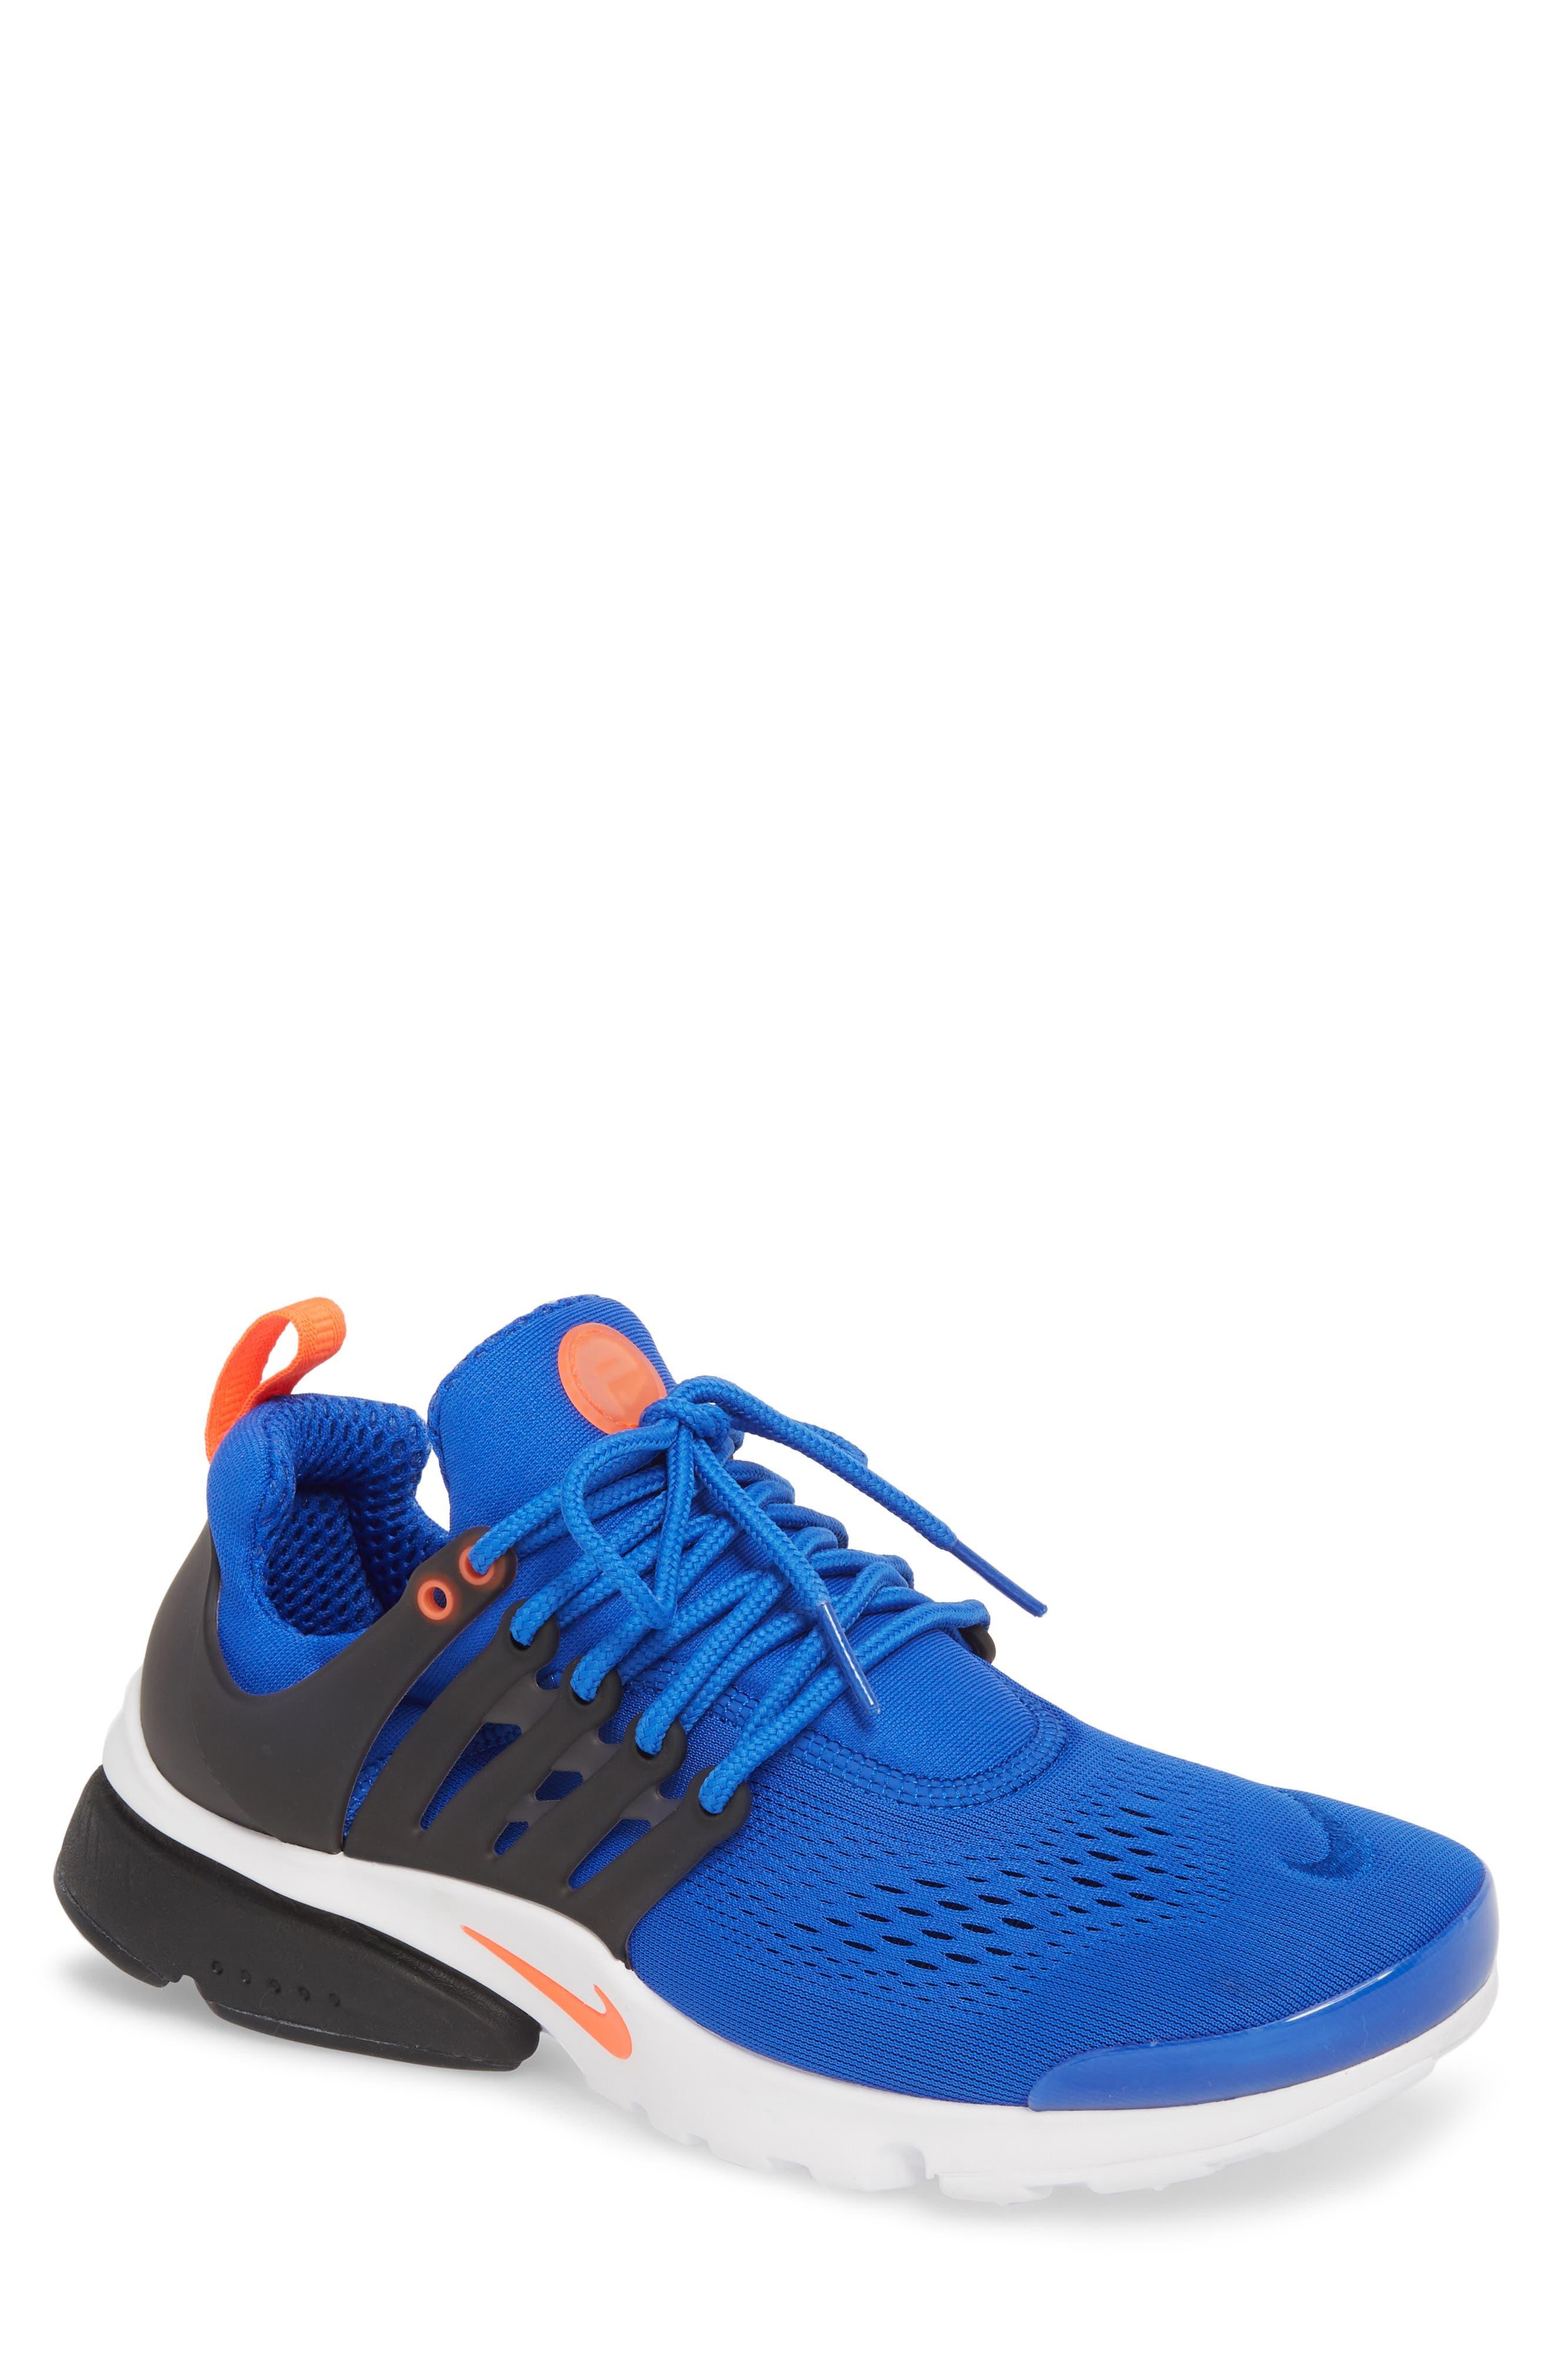 Air Presto Ultra Breathe Sneaker,                         Main,                         color, Racer Blue/ Total Crimson